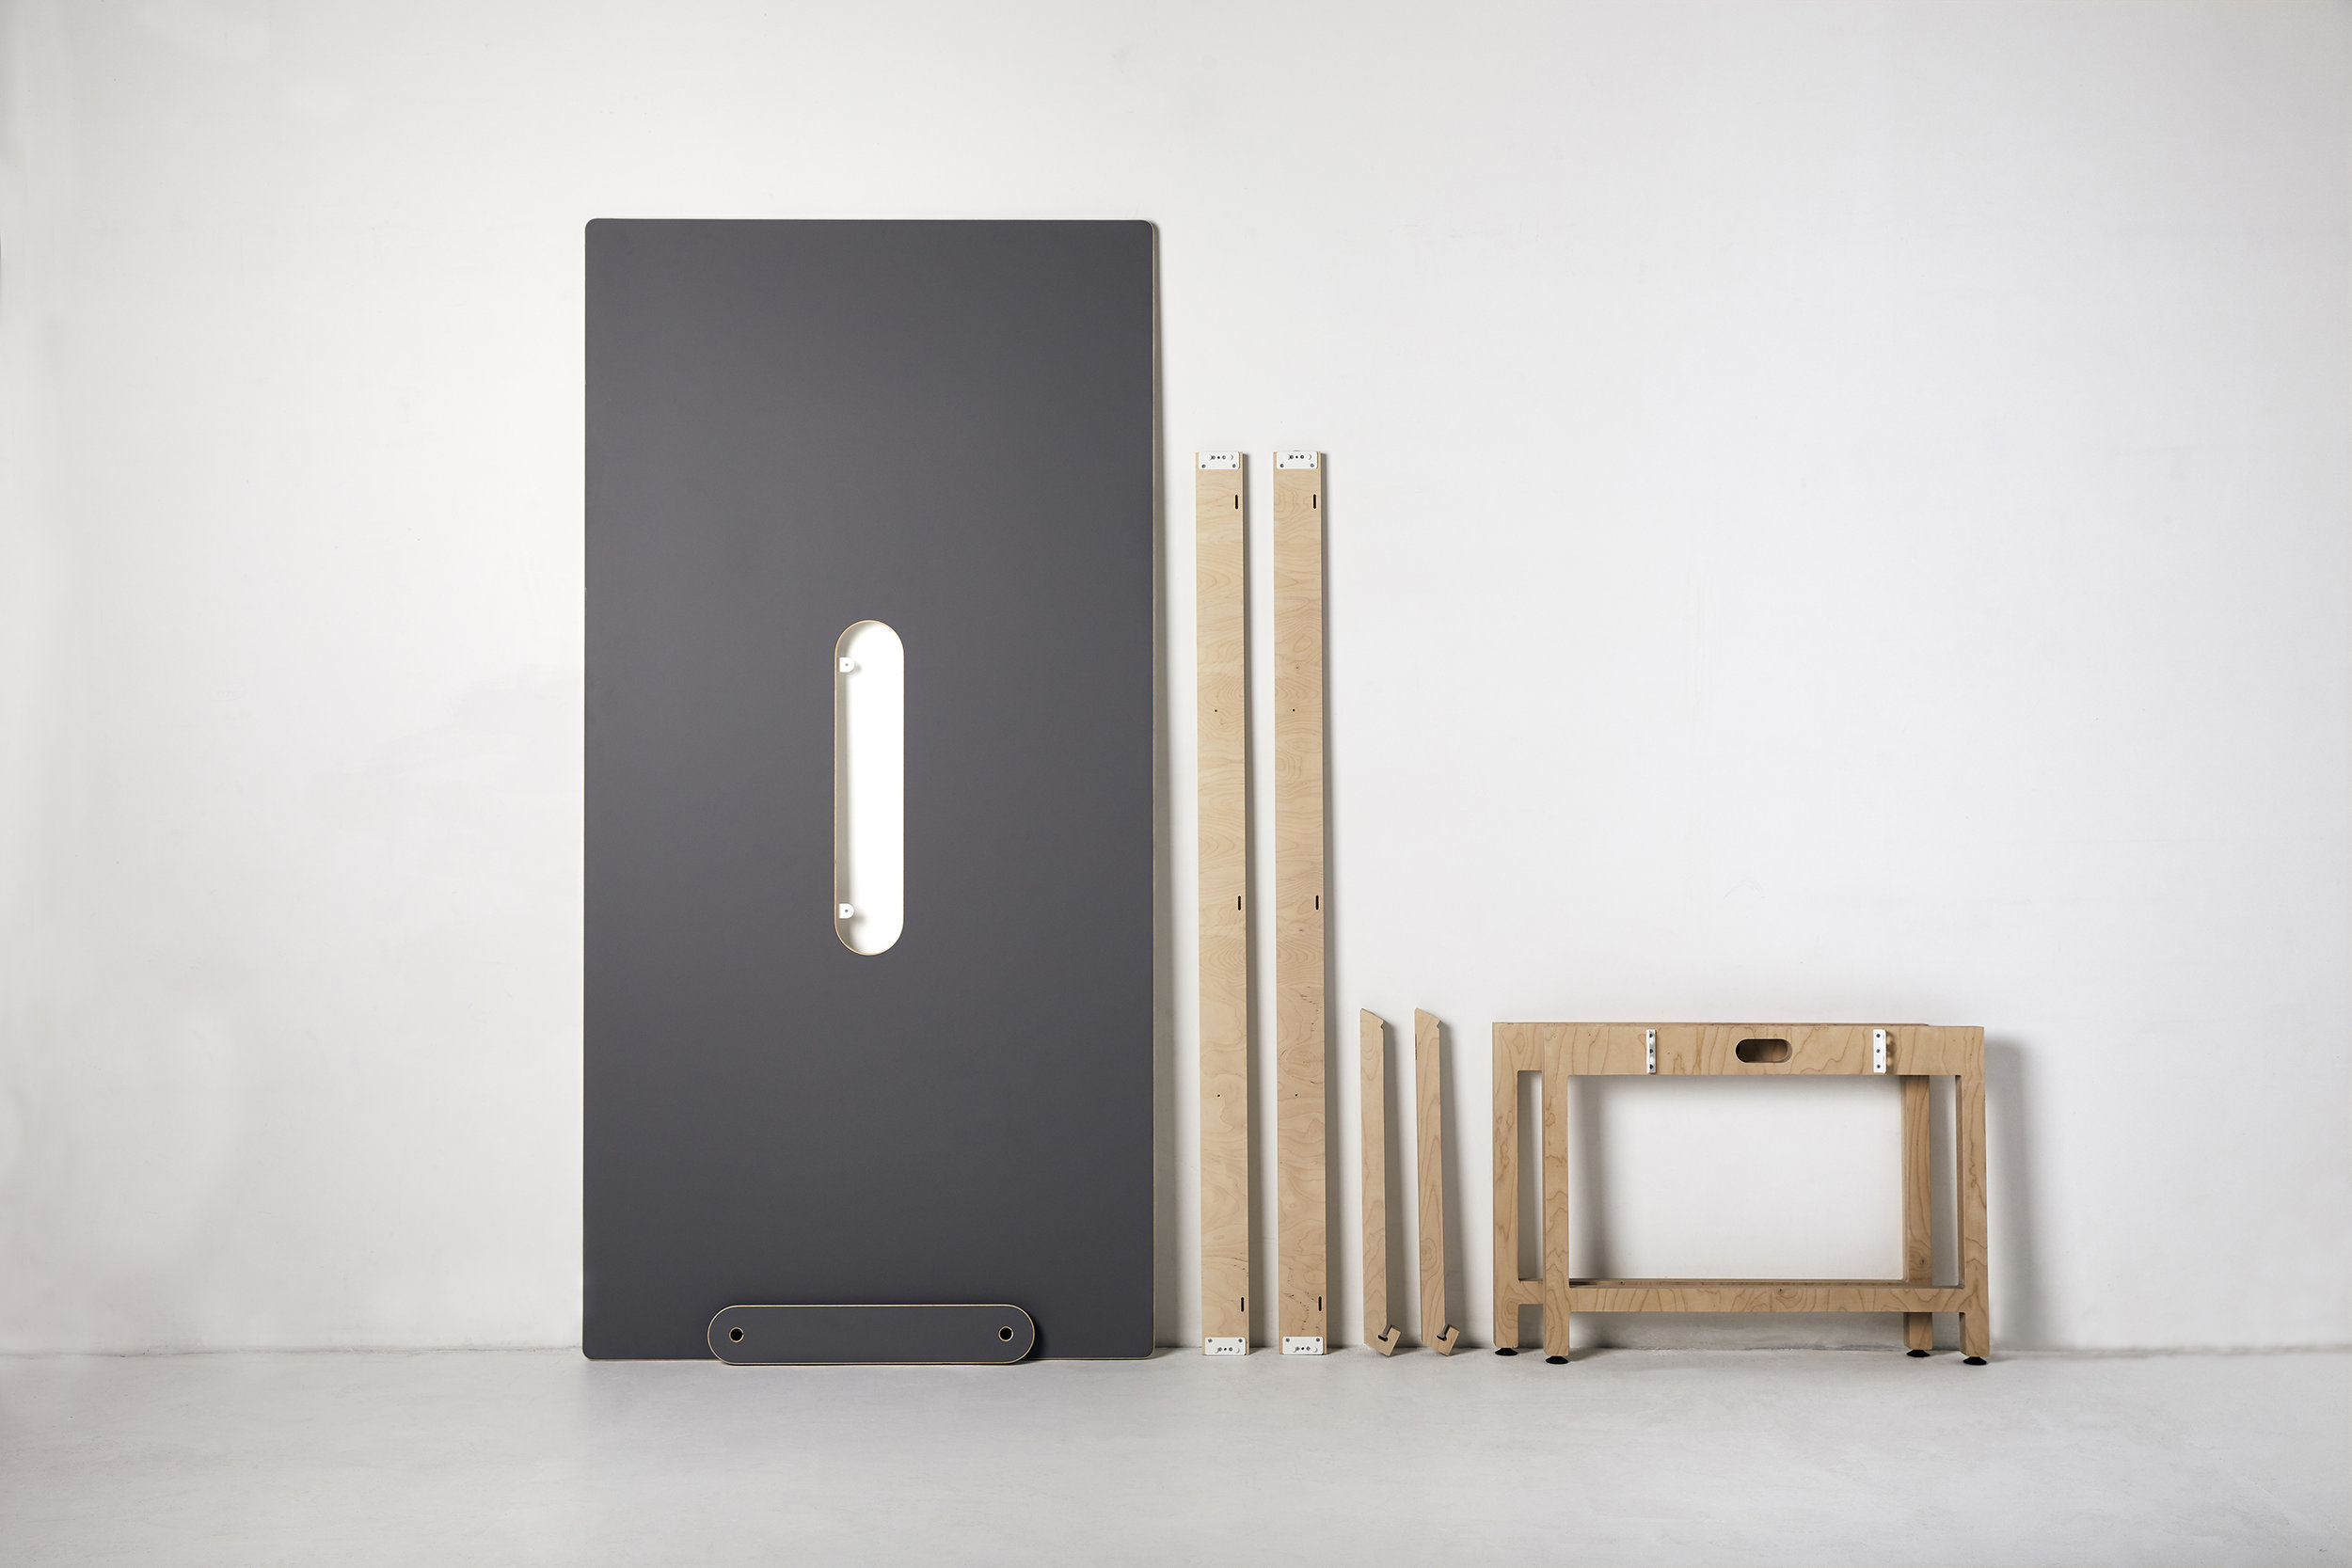 SoWatt-Rover-Team-Table-Plywood-Workstation-Photography_NicGossage-01.jpg